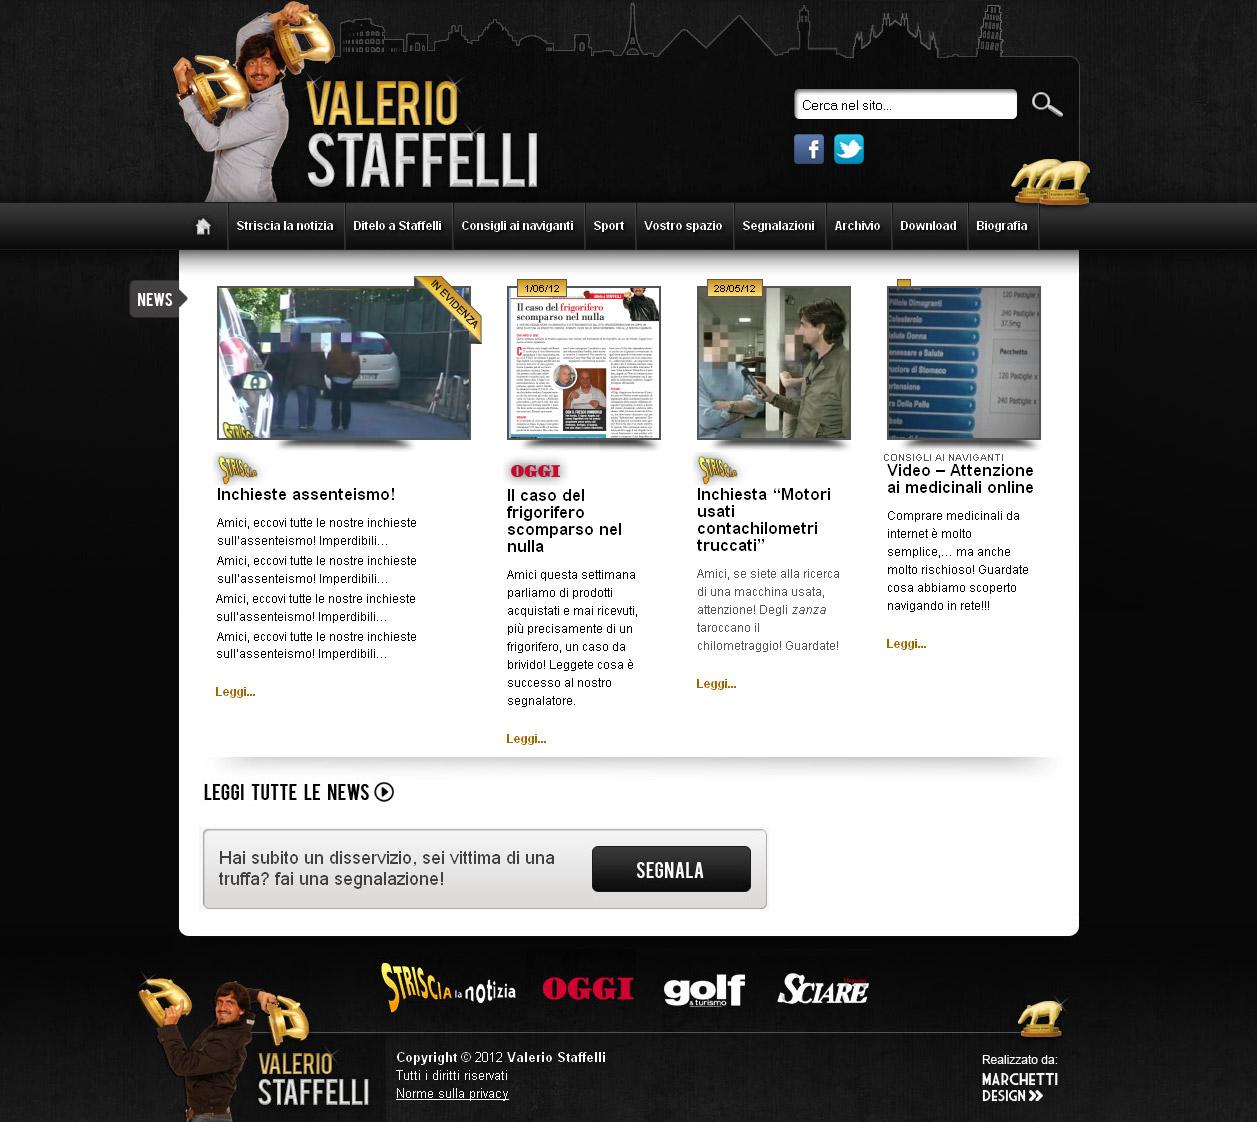 Home Page Fancierstudio Com: Valerio Staffelli